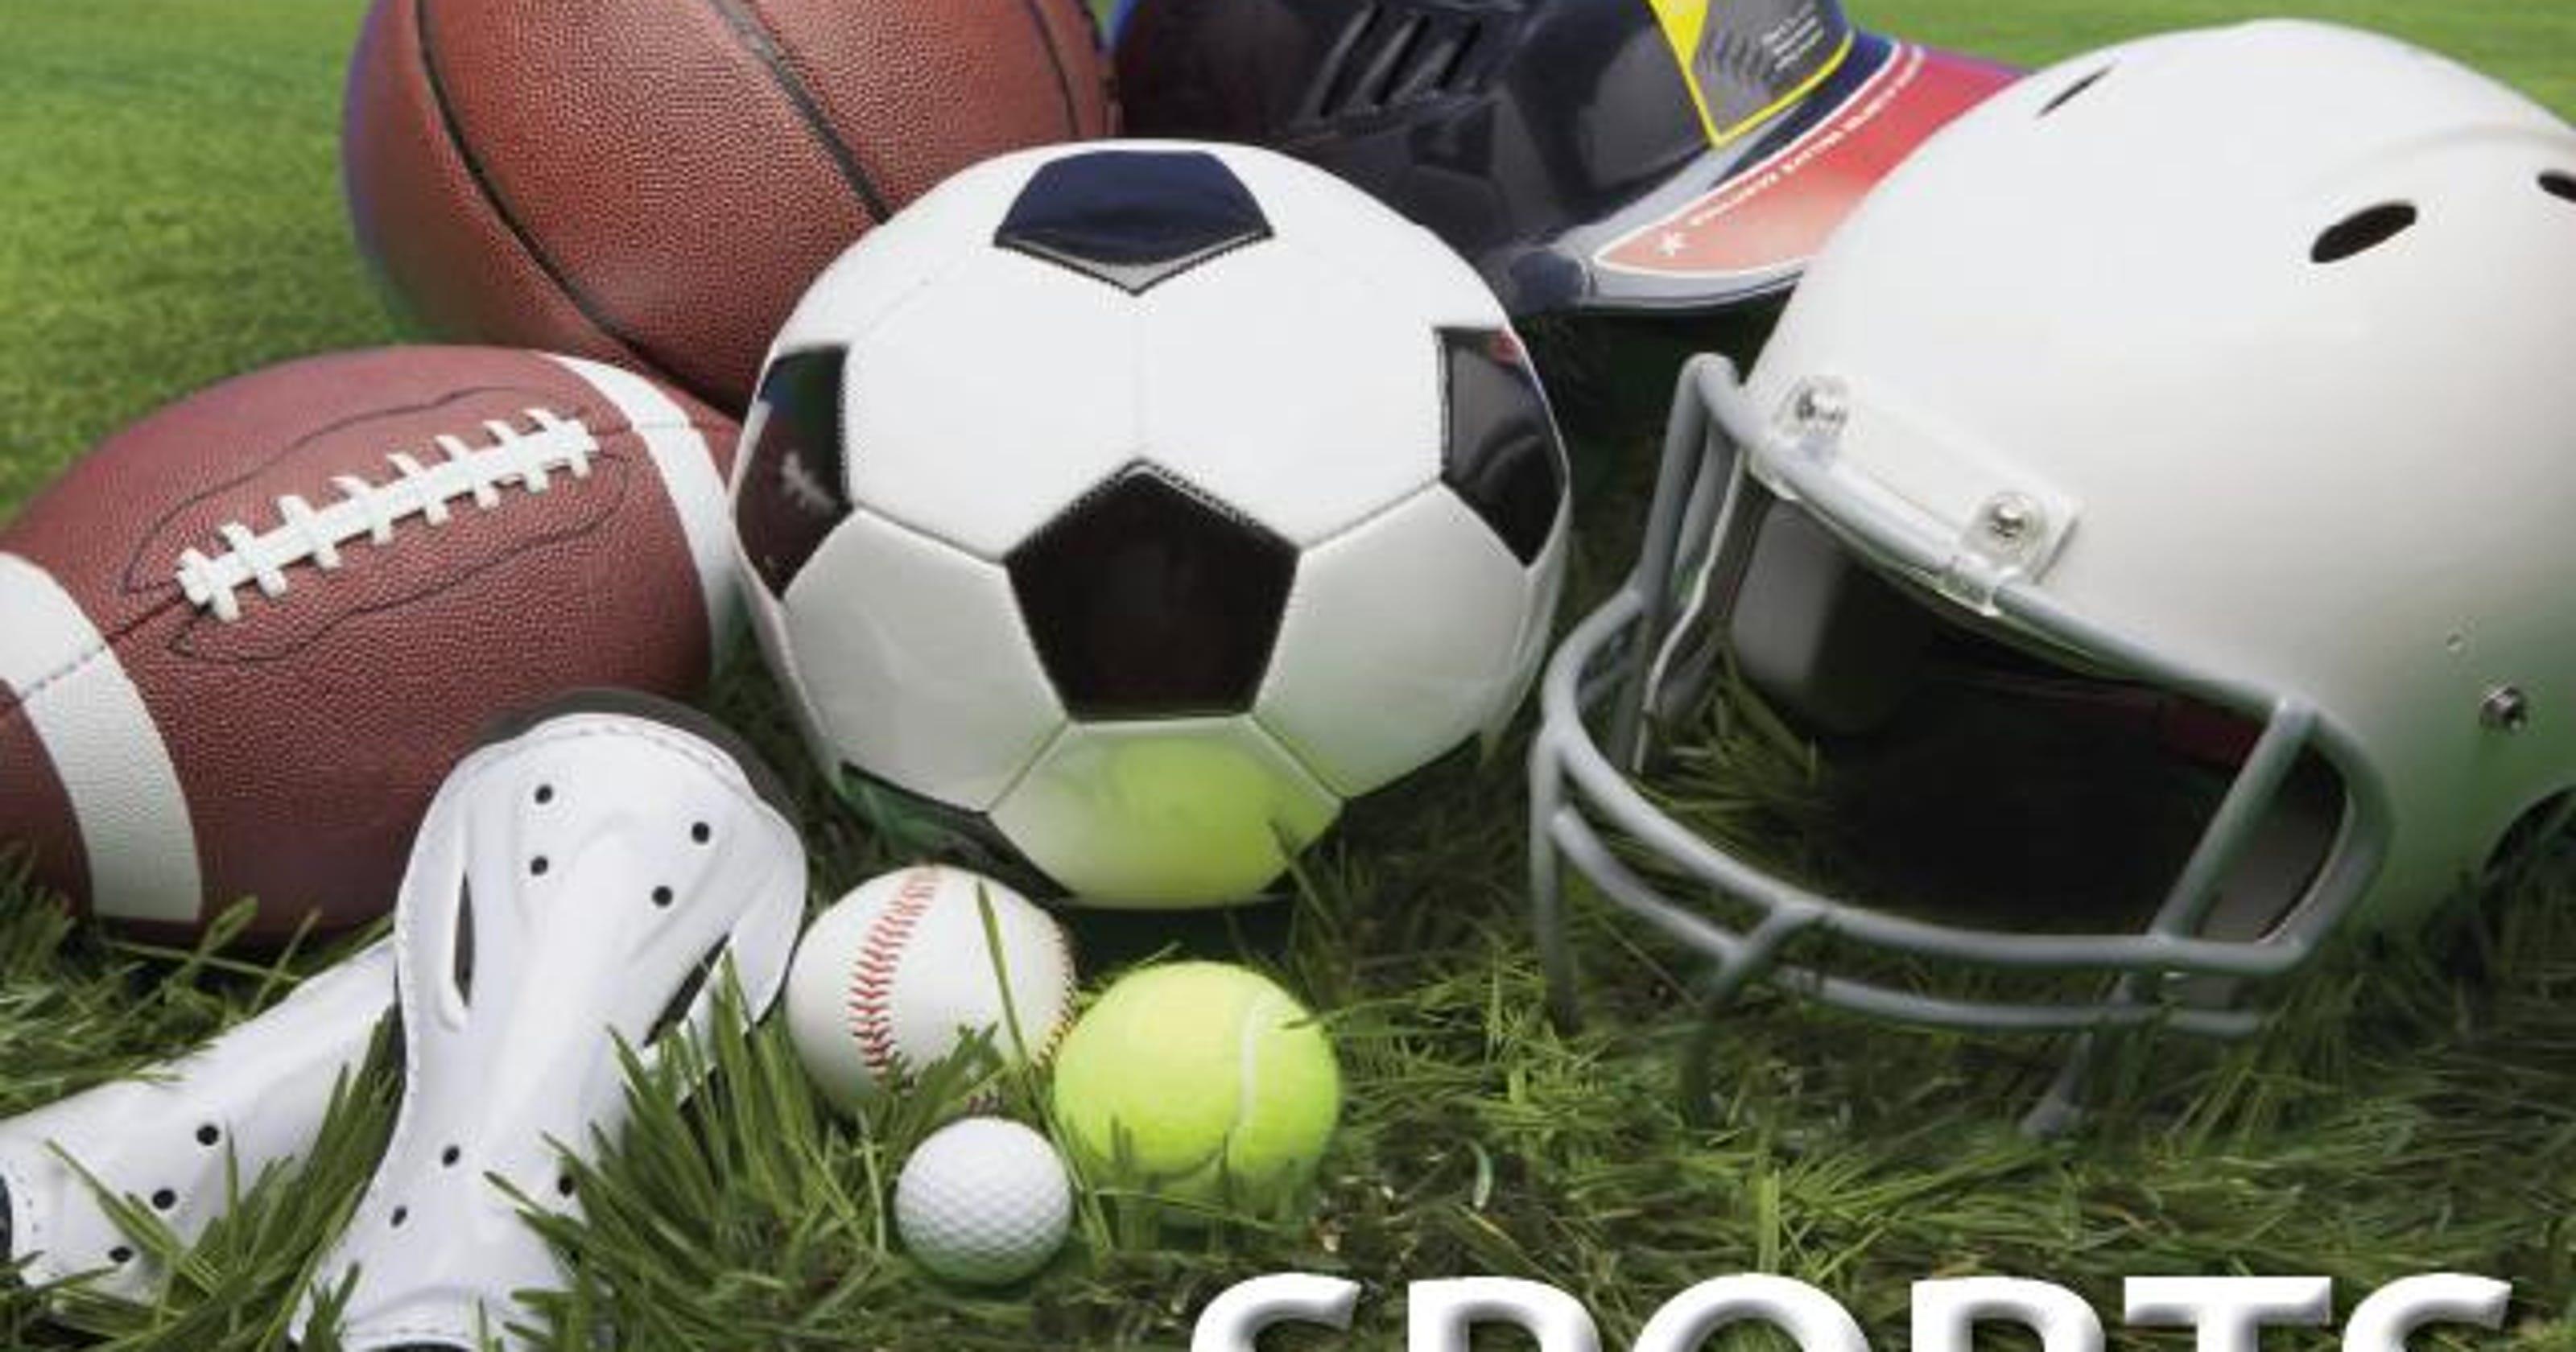 Murfreesboro Antiques Mall Becoming Sports Facility